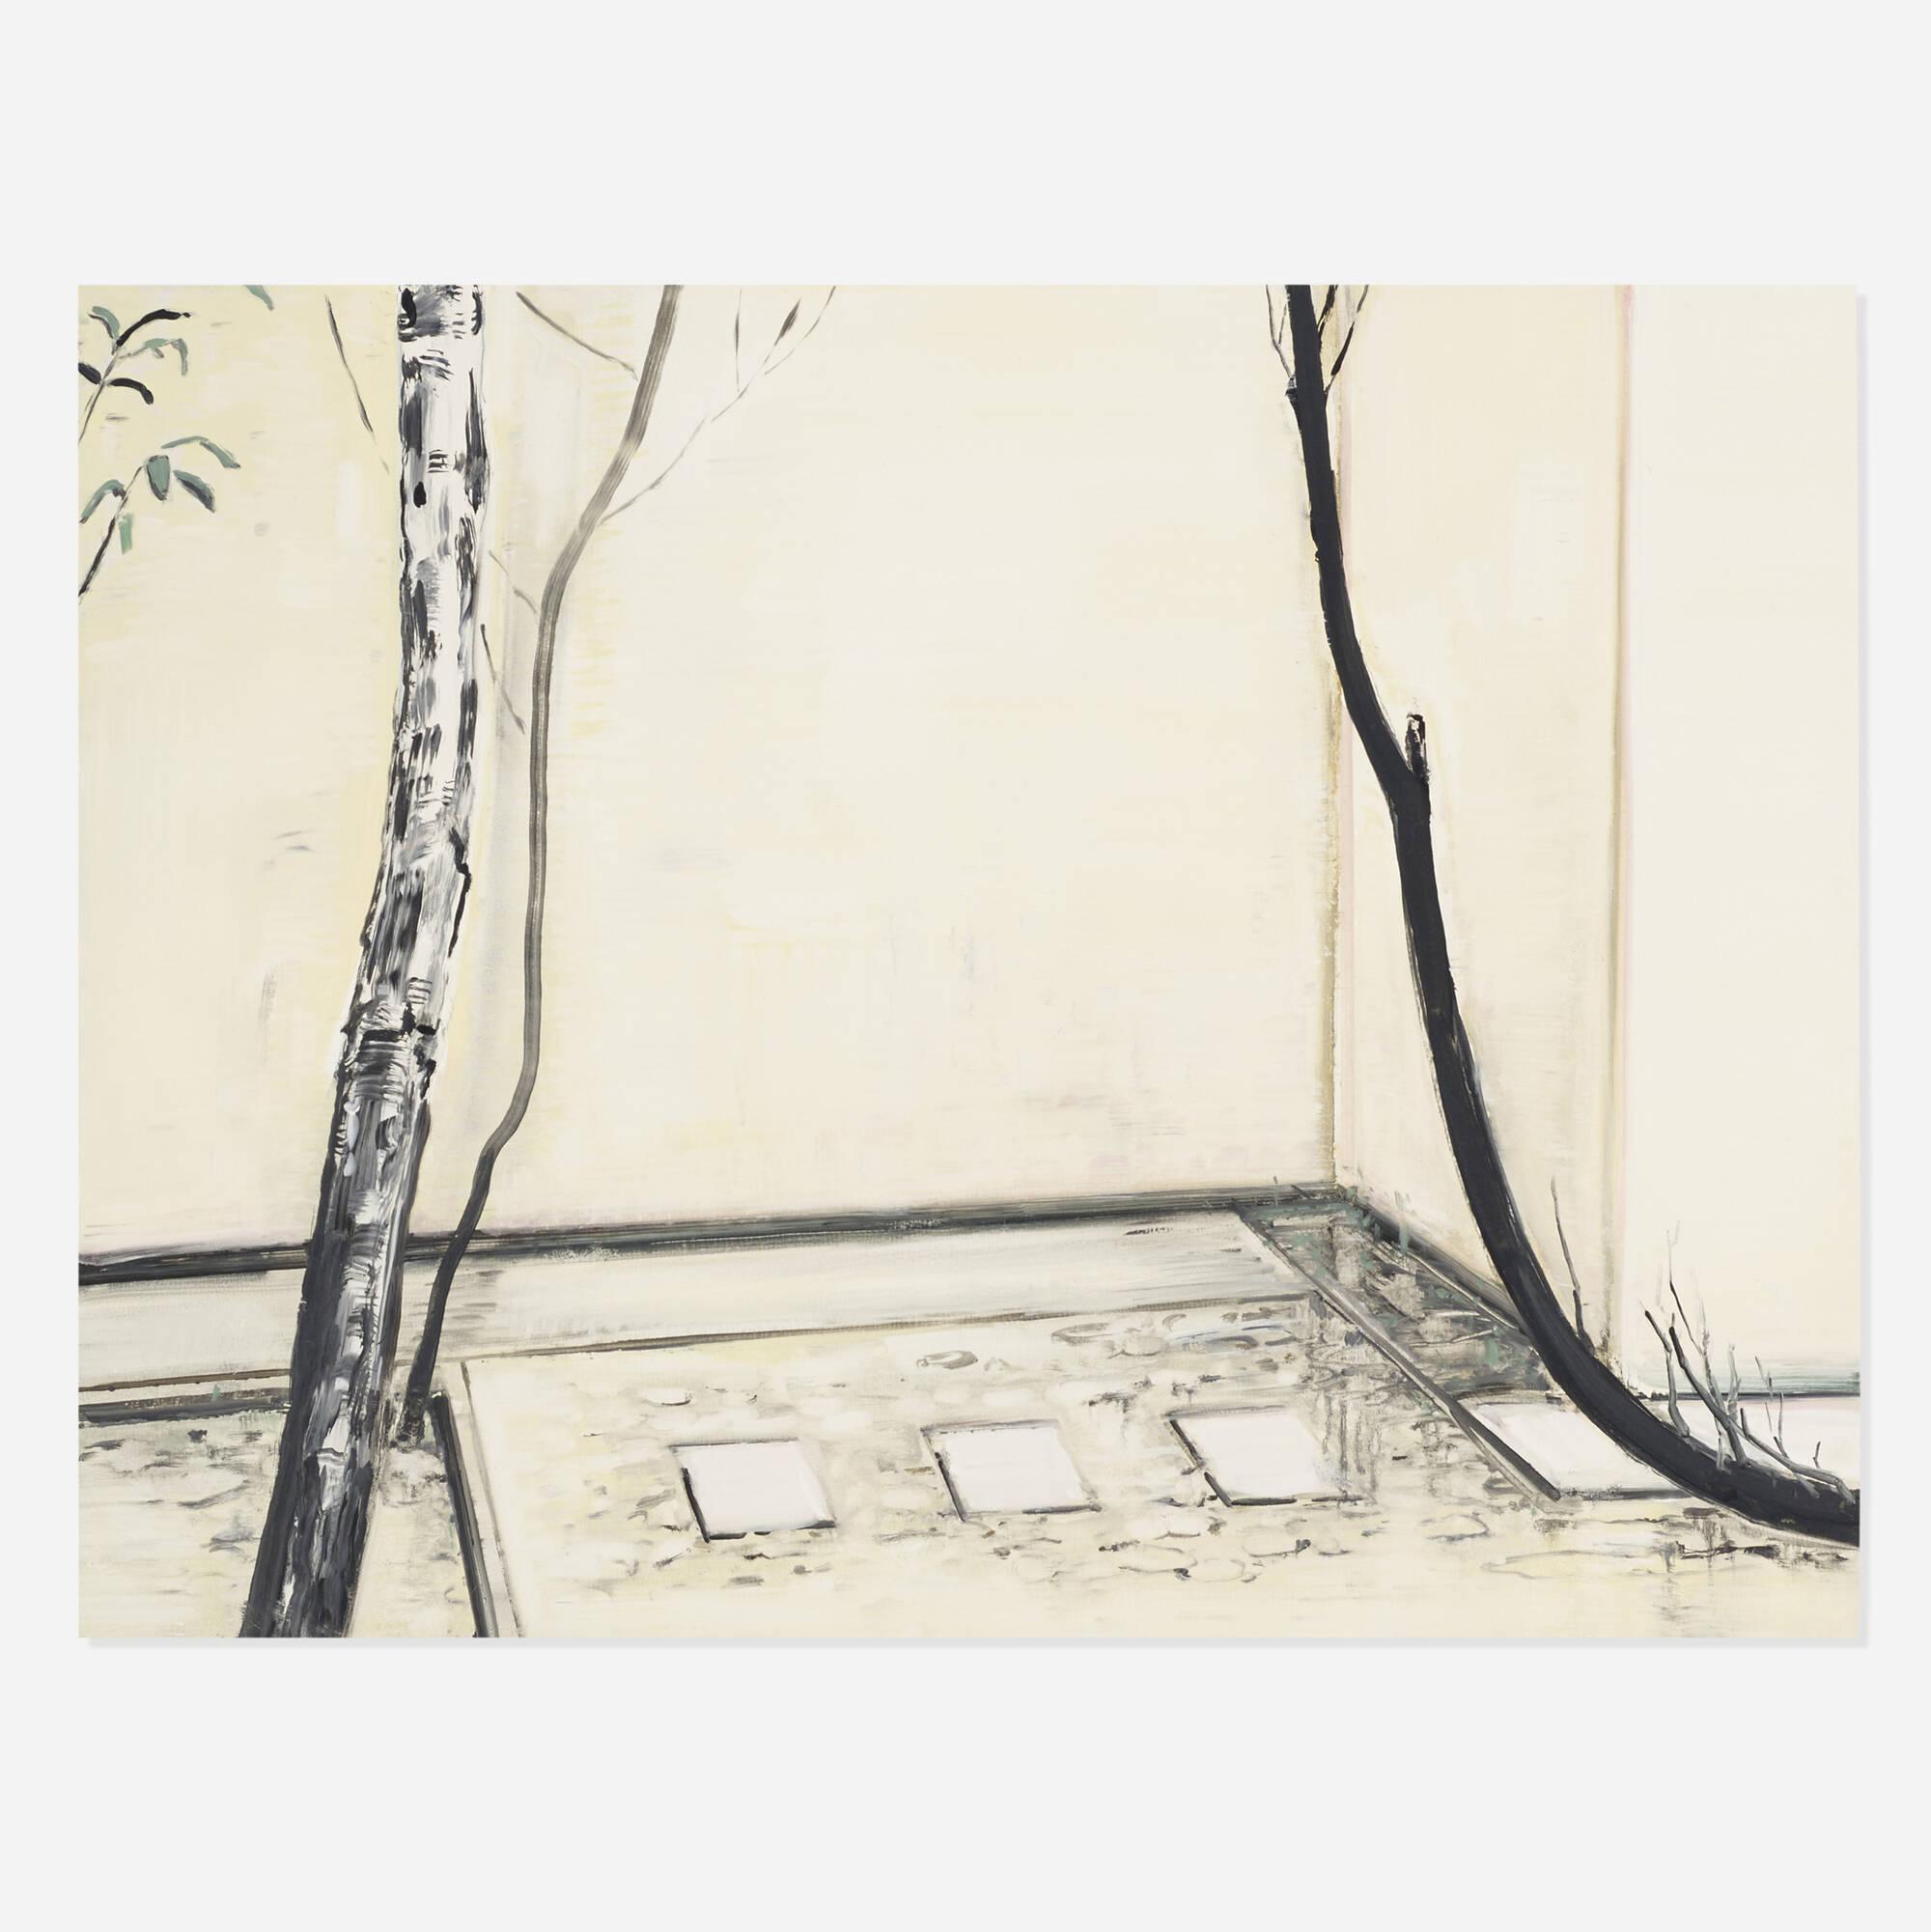 107: Adam Adach / Roots (1 of 2)